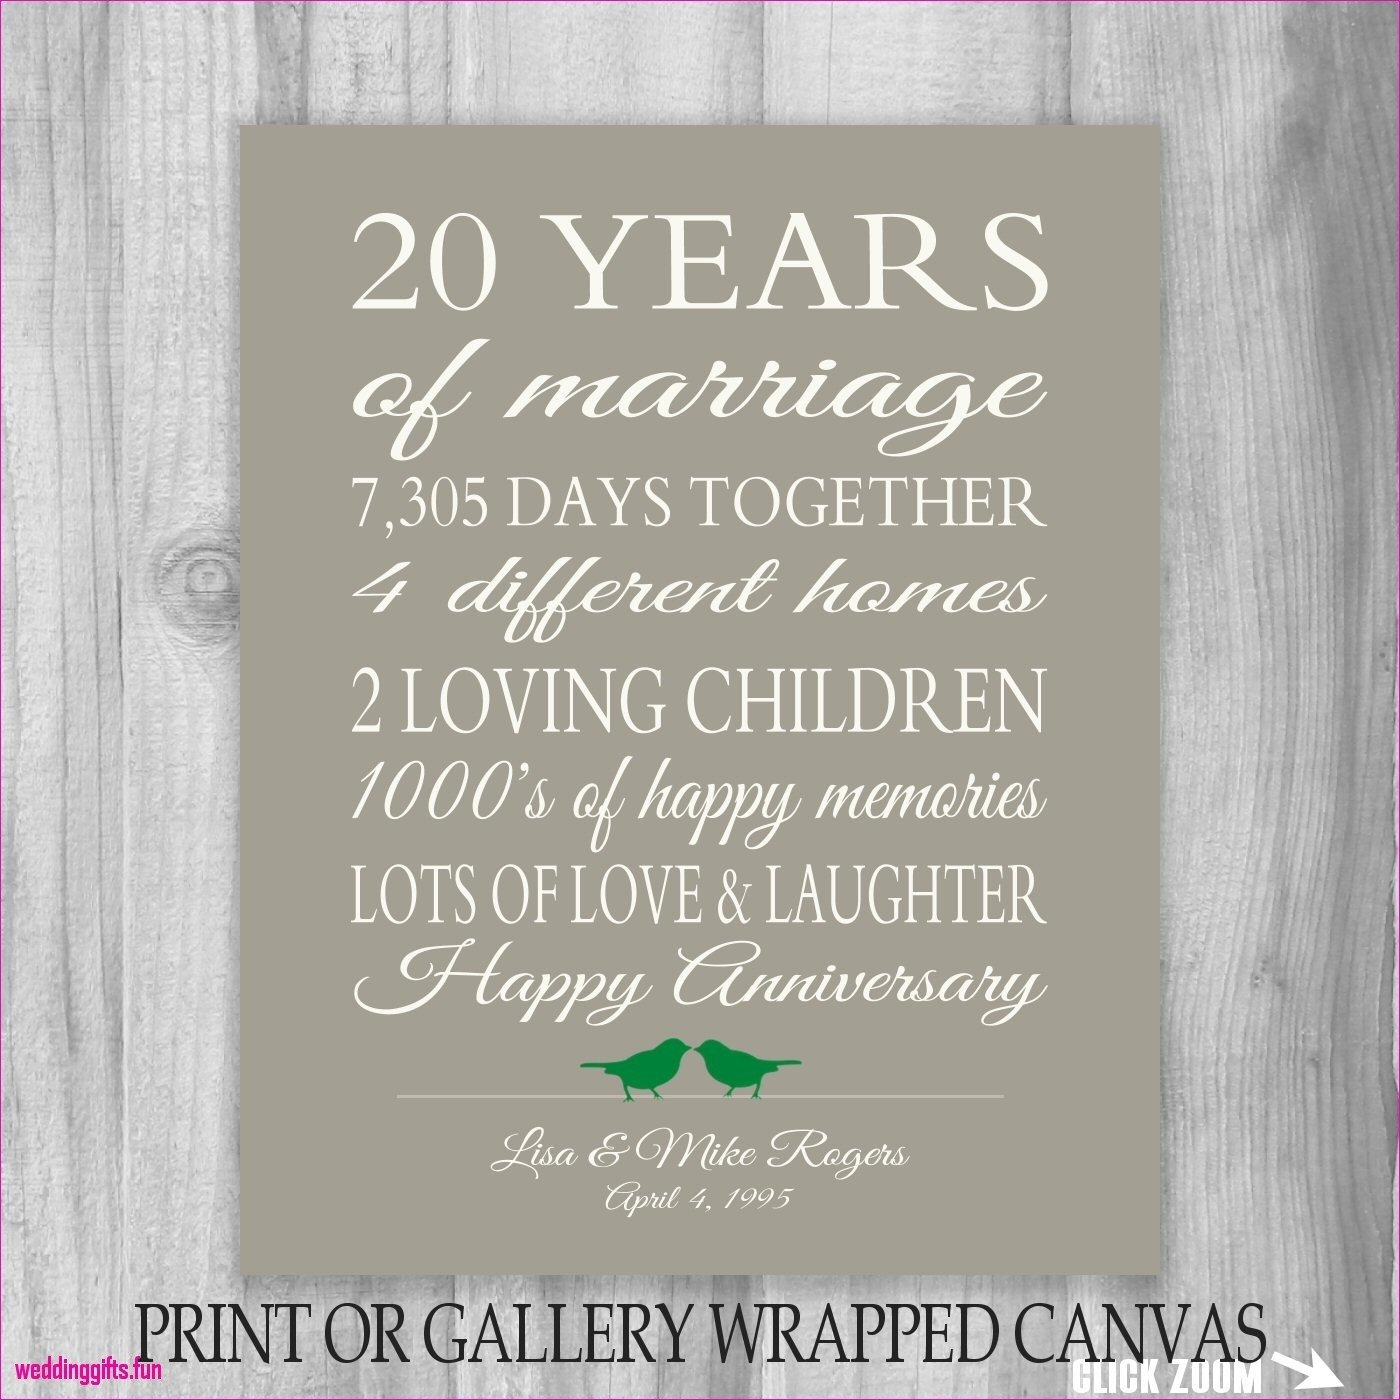 10 Elegant 20Th Wedding Anniversary Gift Ideas For Husband fresh 20th wedding anniversary gifts for her foxy wedding gifts 4 2021